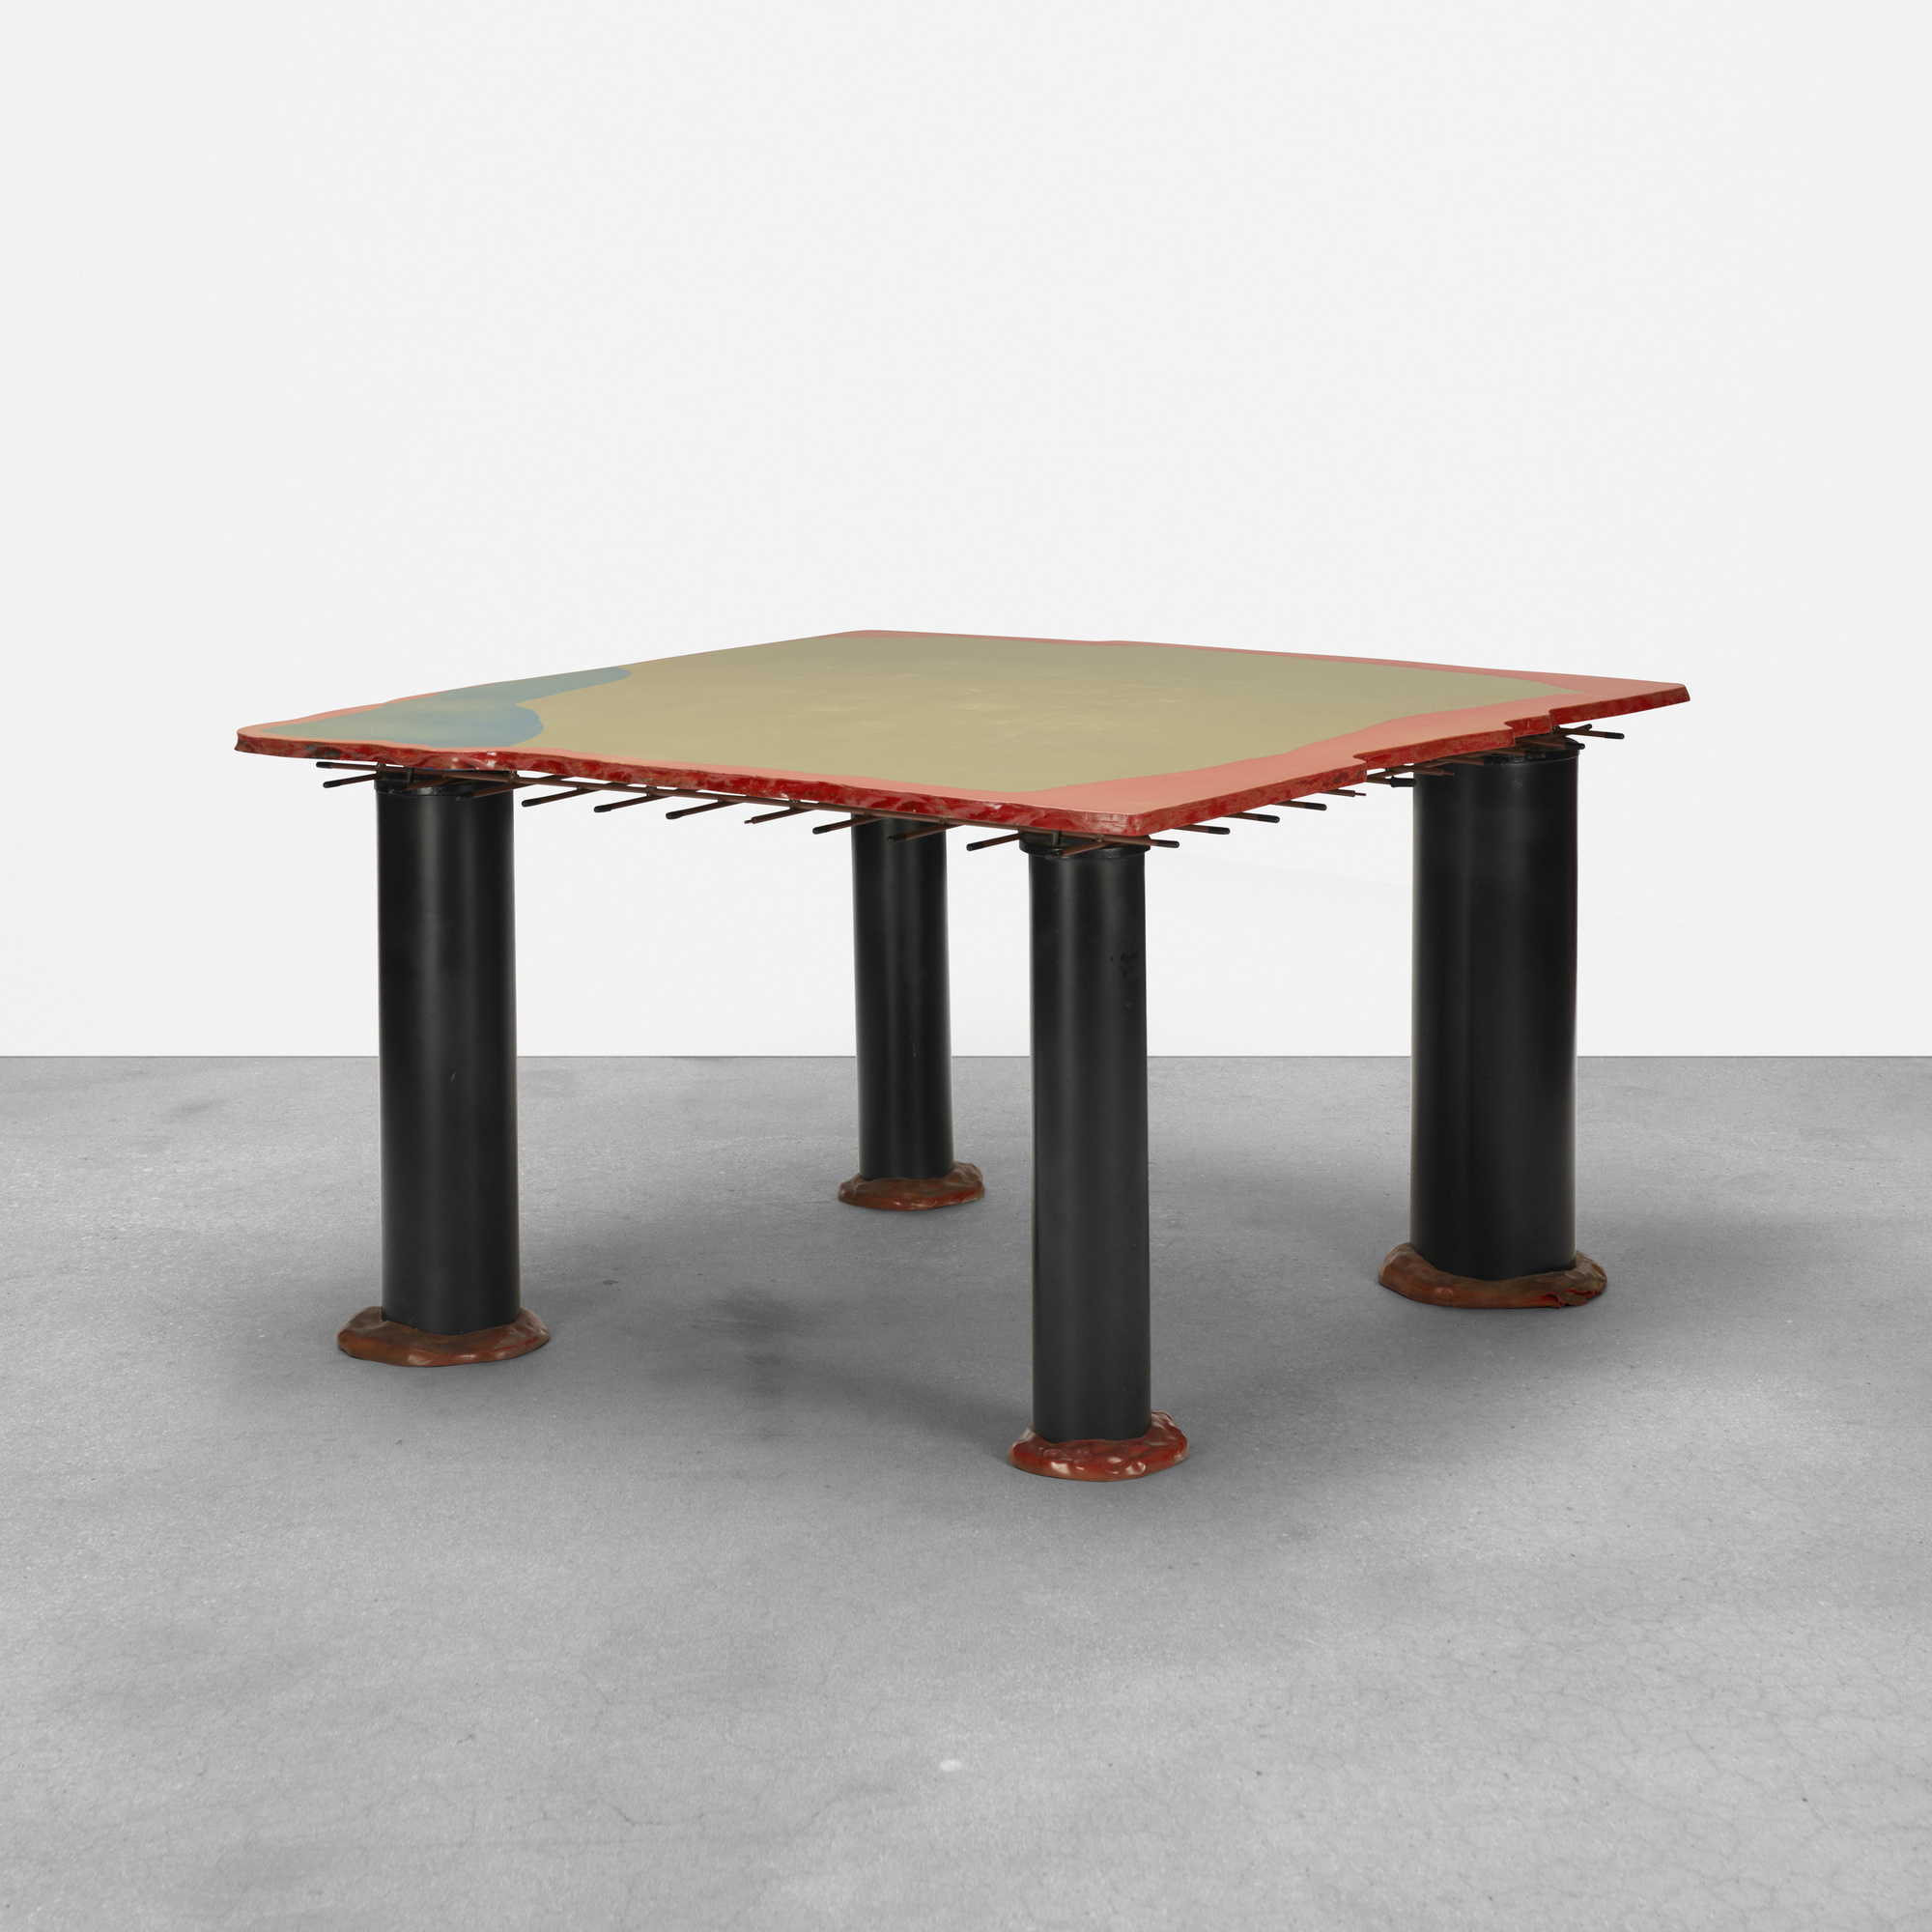 292: Gaetano Pesce / Sansone II dining table (1 of 3)